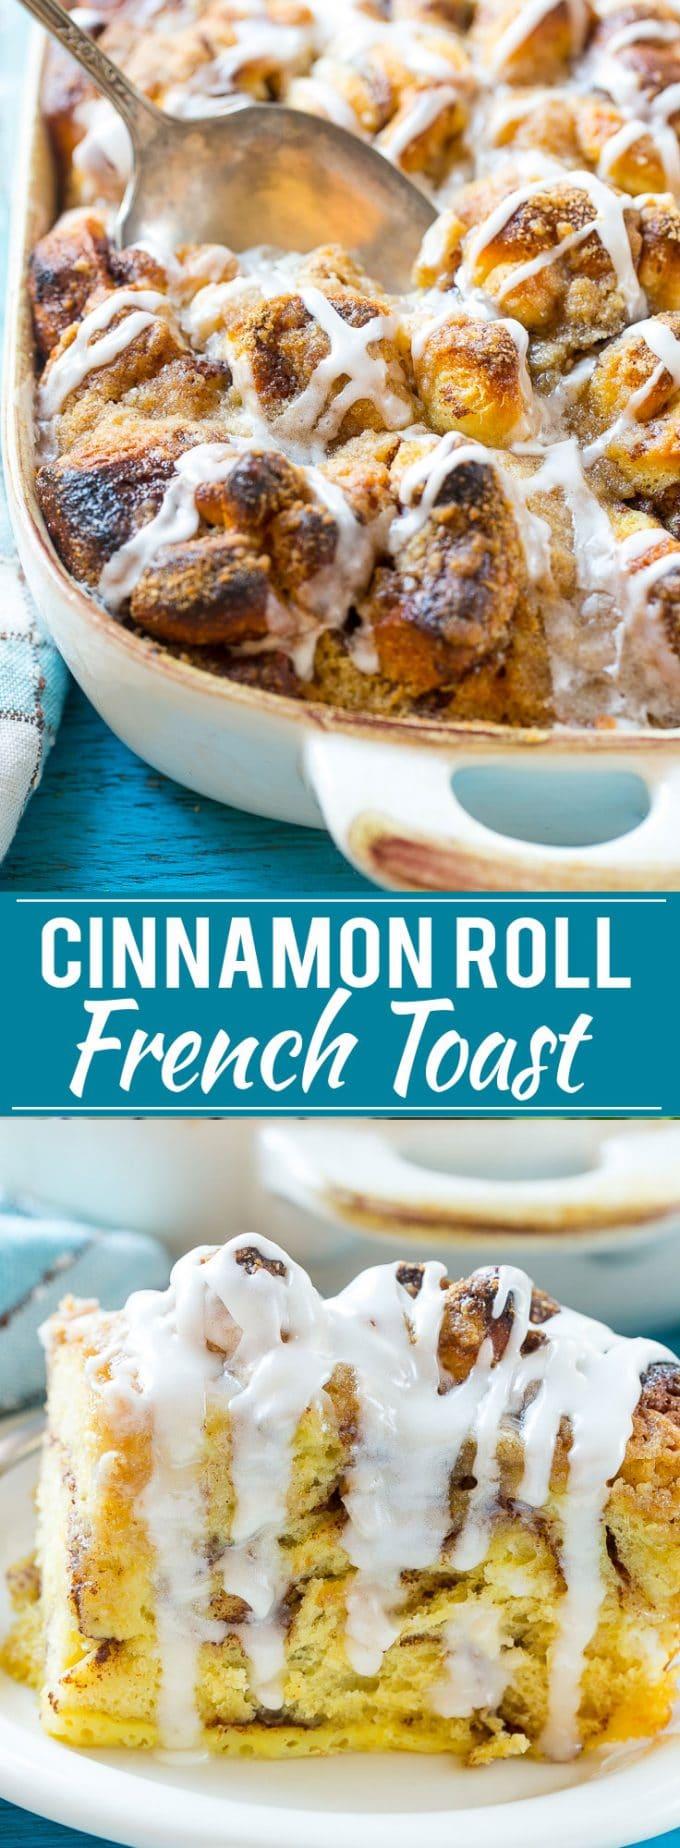 Cinnamon Roll French Toast Recipe | Cinnamon Roll Casserole | Breakfast Casserole | Cinnamon Rolls | French Toast Casserole